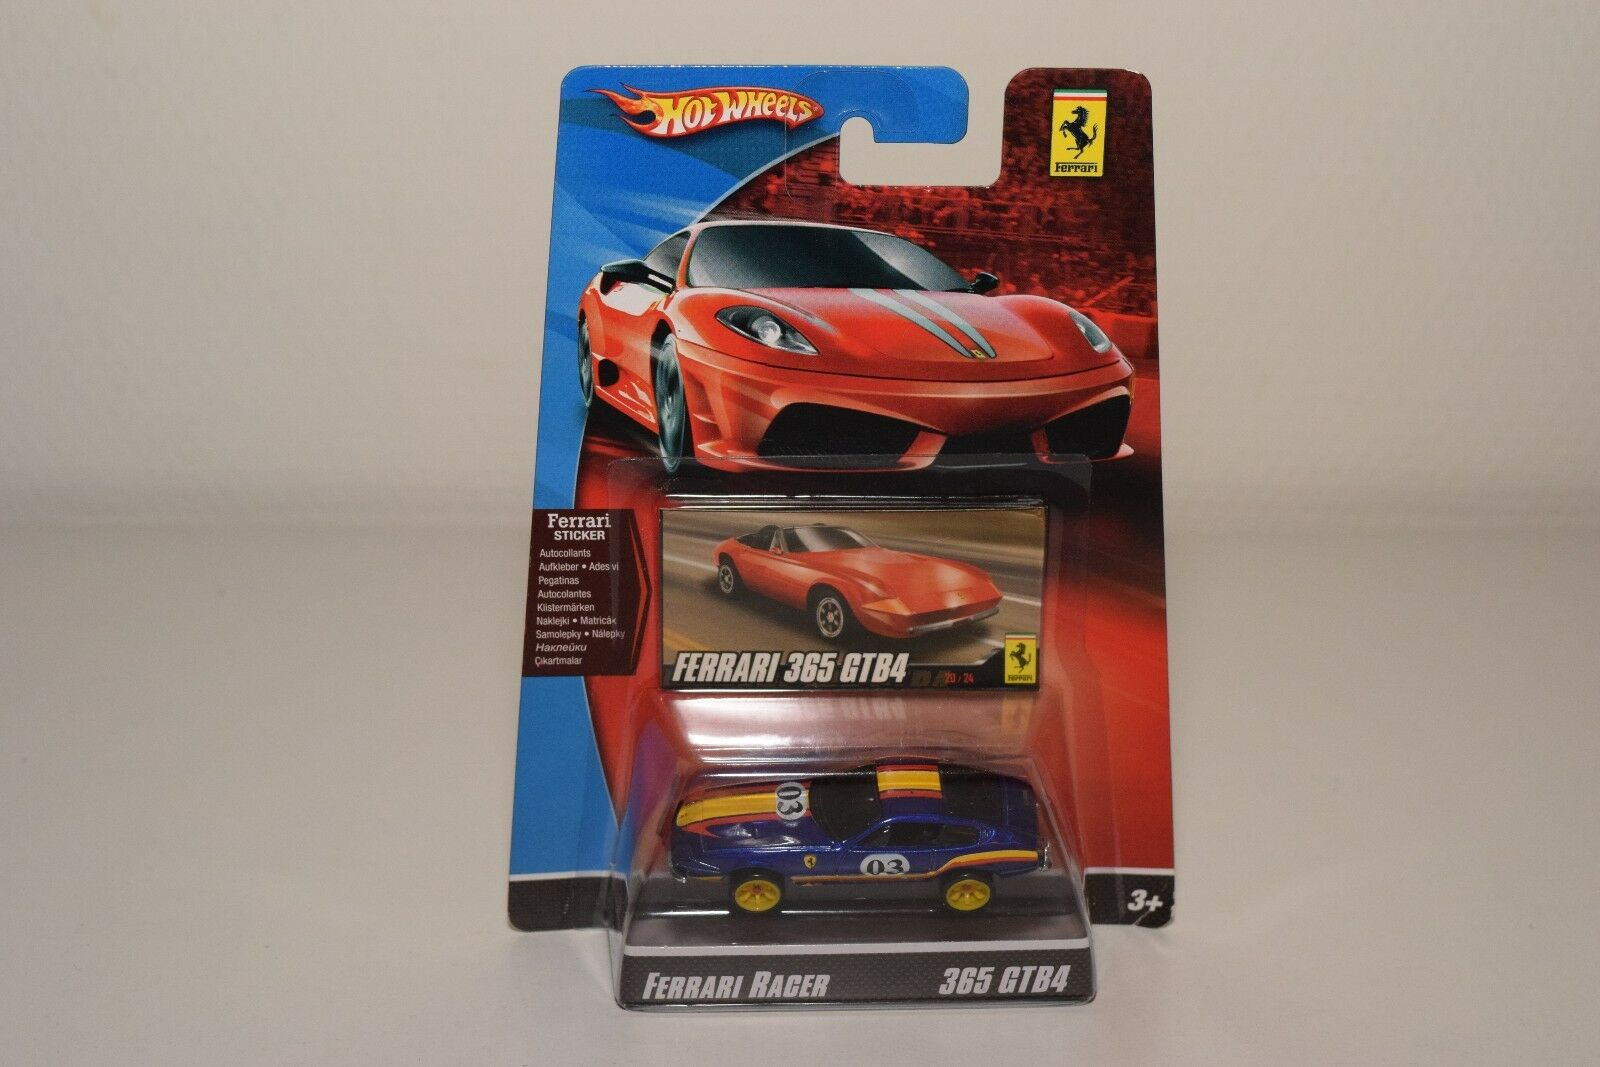 V 1 64 HOTWHEELS RACER FERRARI 365 GTB4 RALLY blu MINT BOXED ON CARD RARE